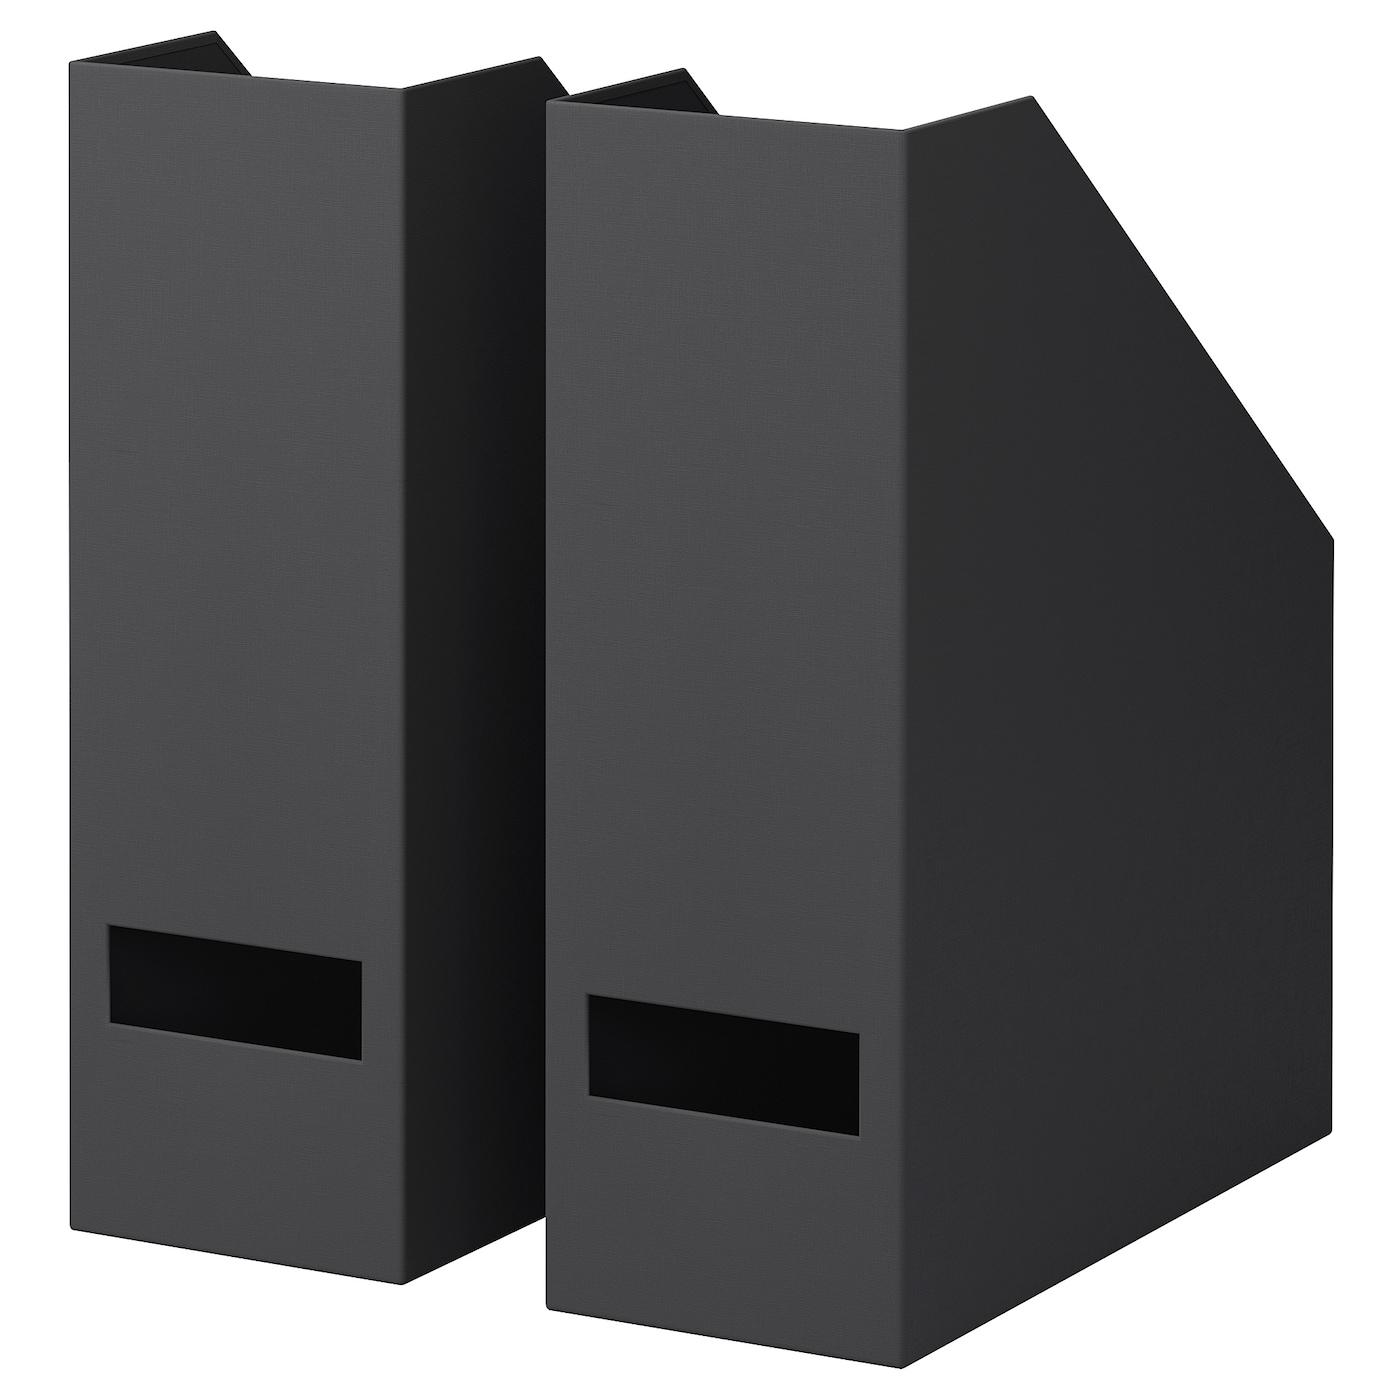 TJENA Magazine file, black, Ikea classroom organization